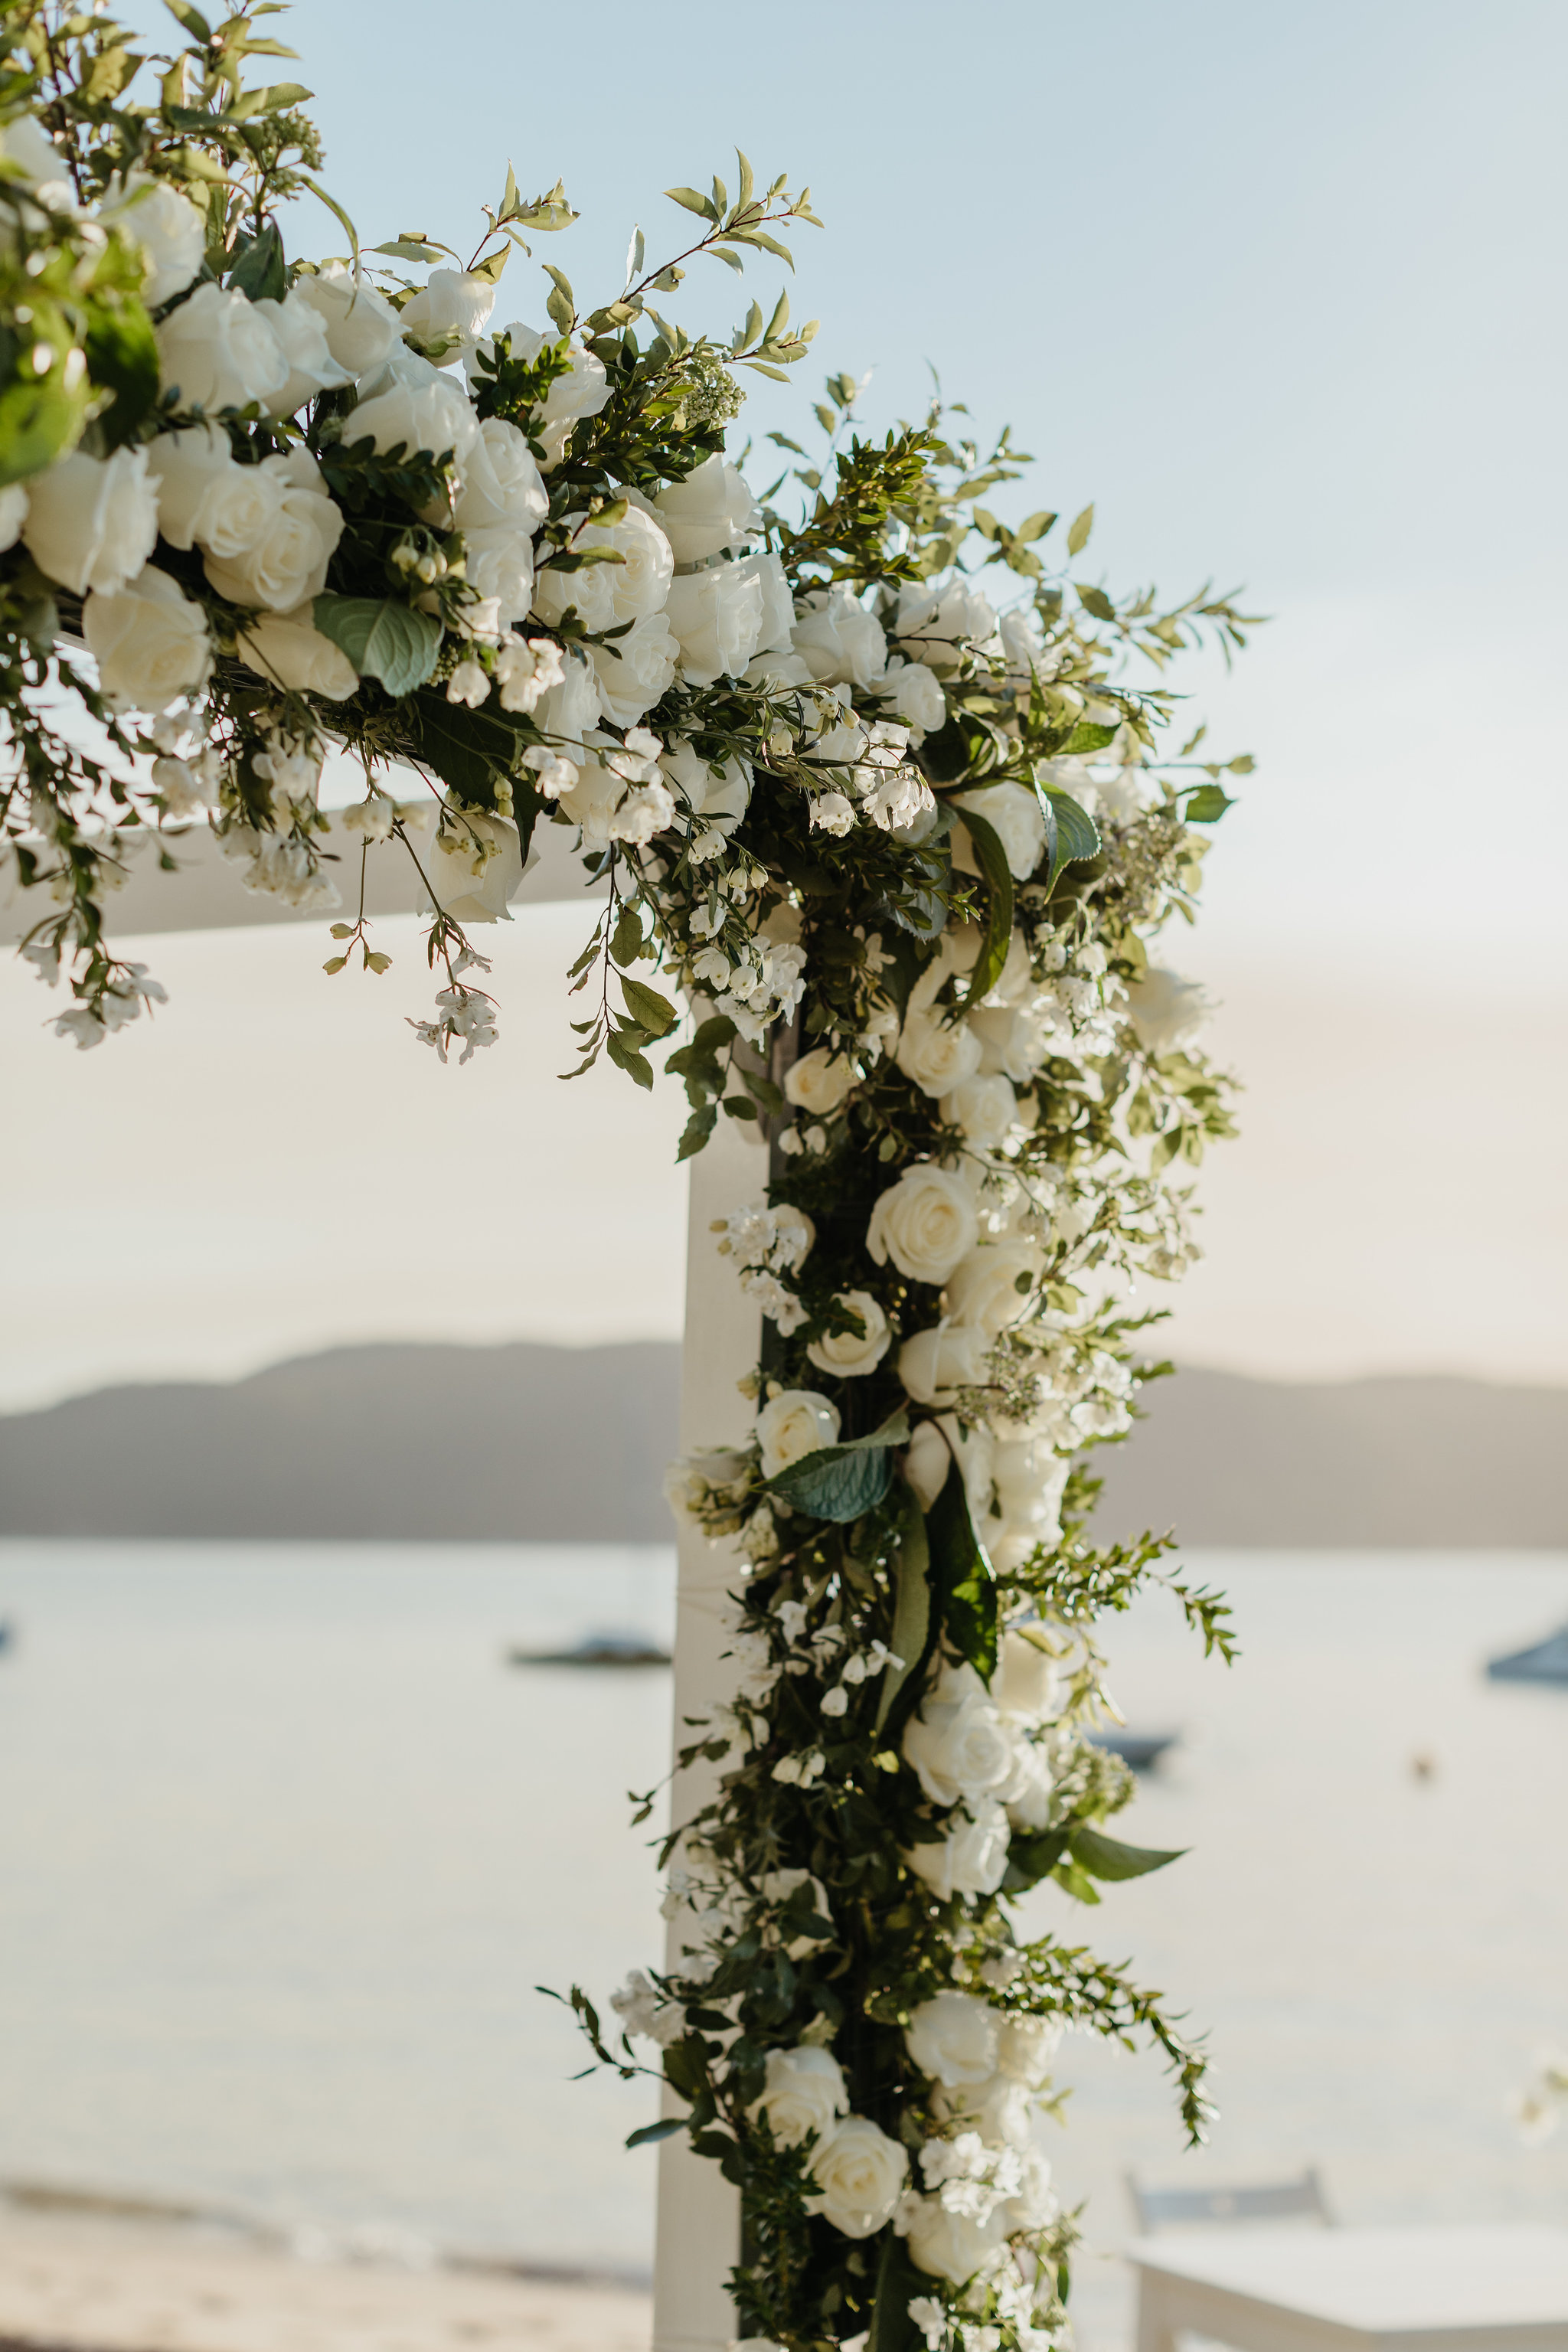 gen_chris_story_of_us_wedding-0456.JPG